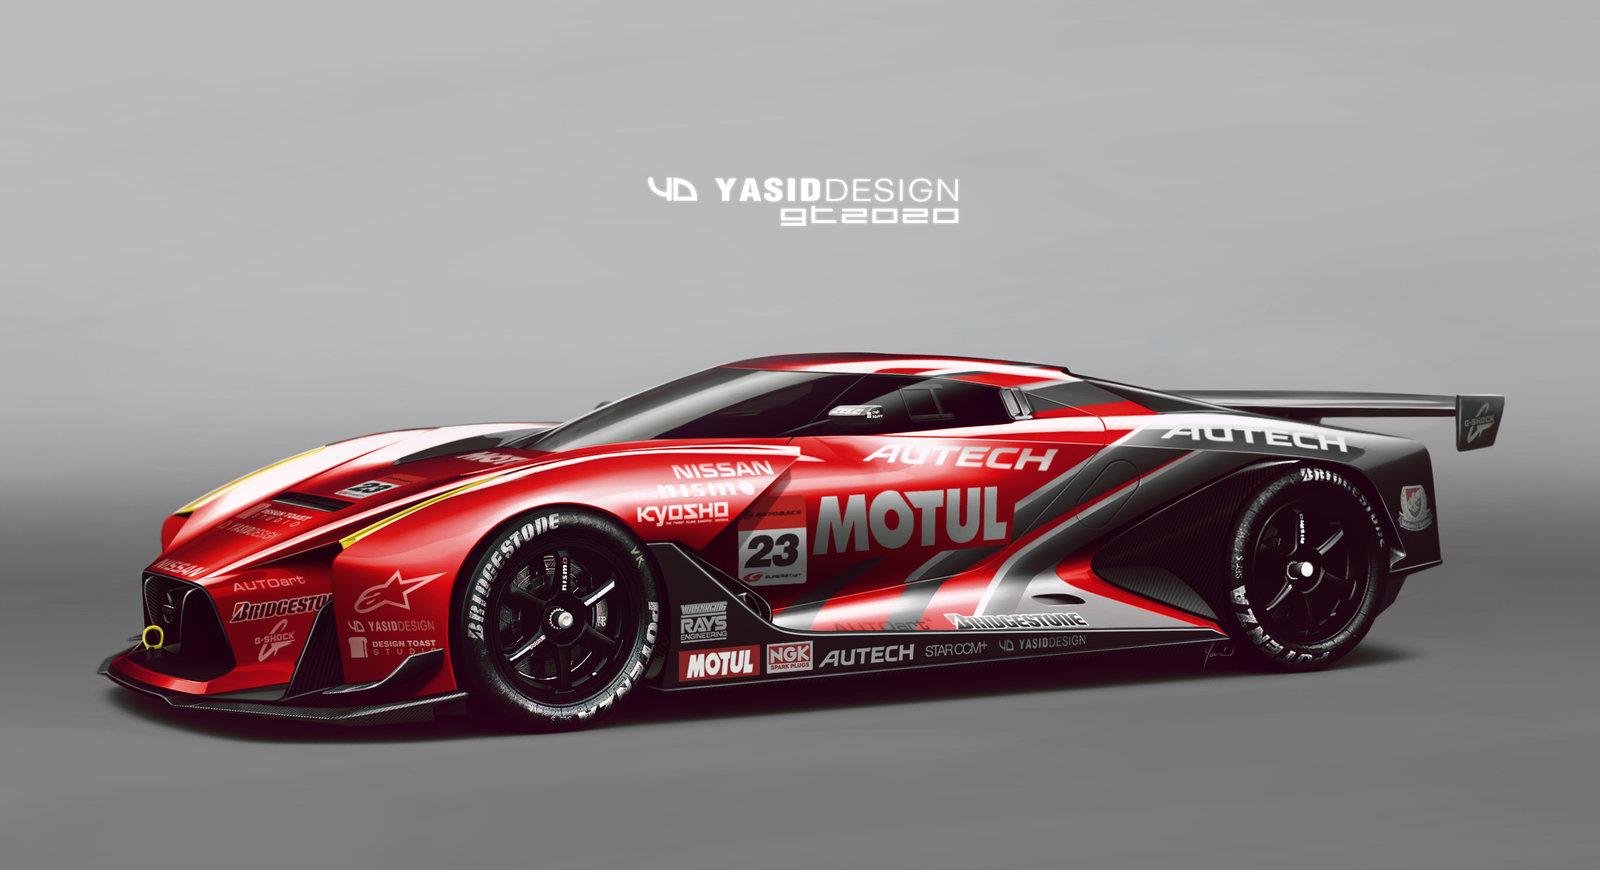 Nissan GT 2020 Motul